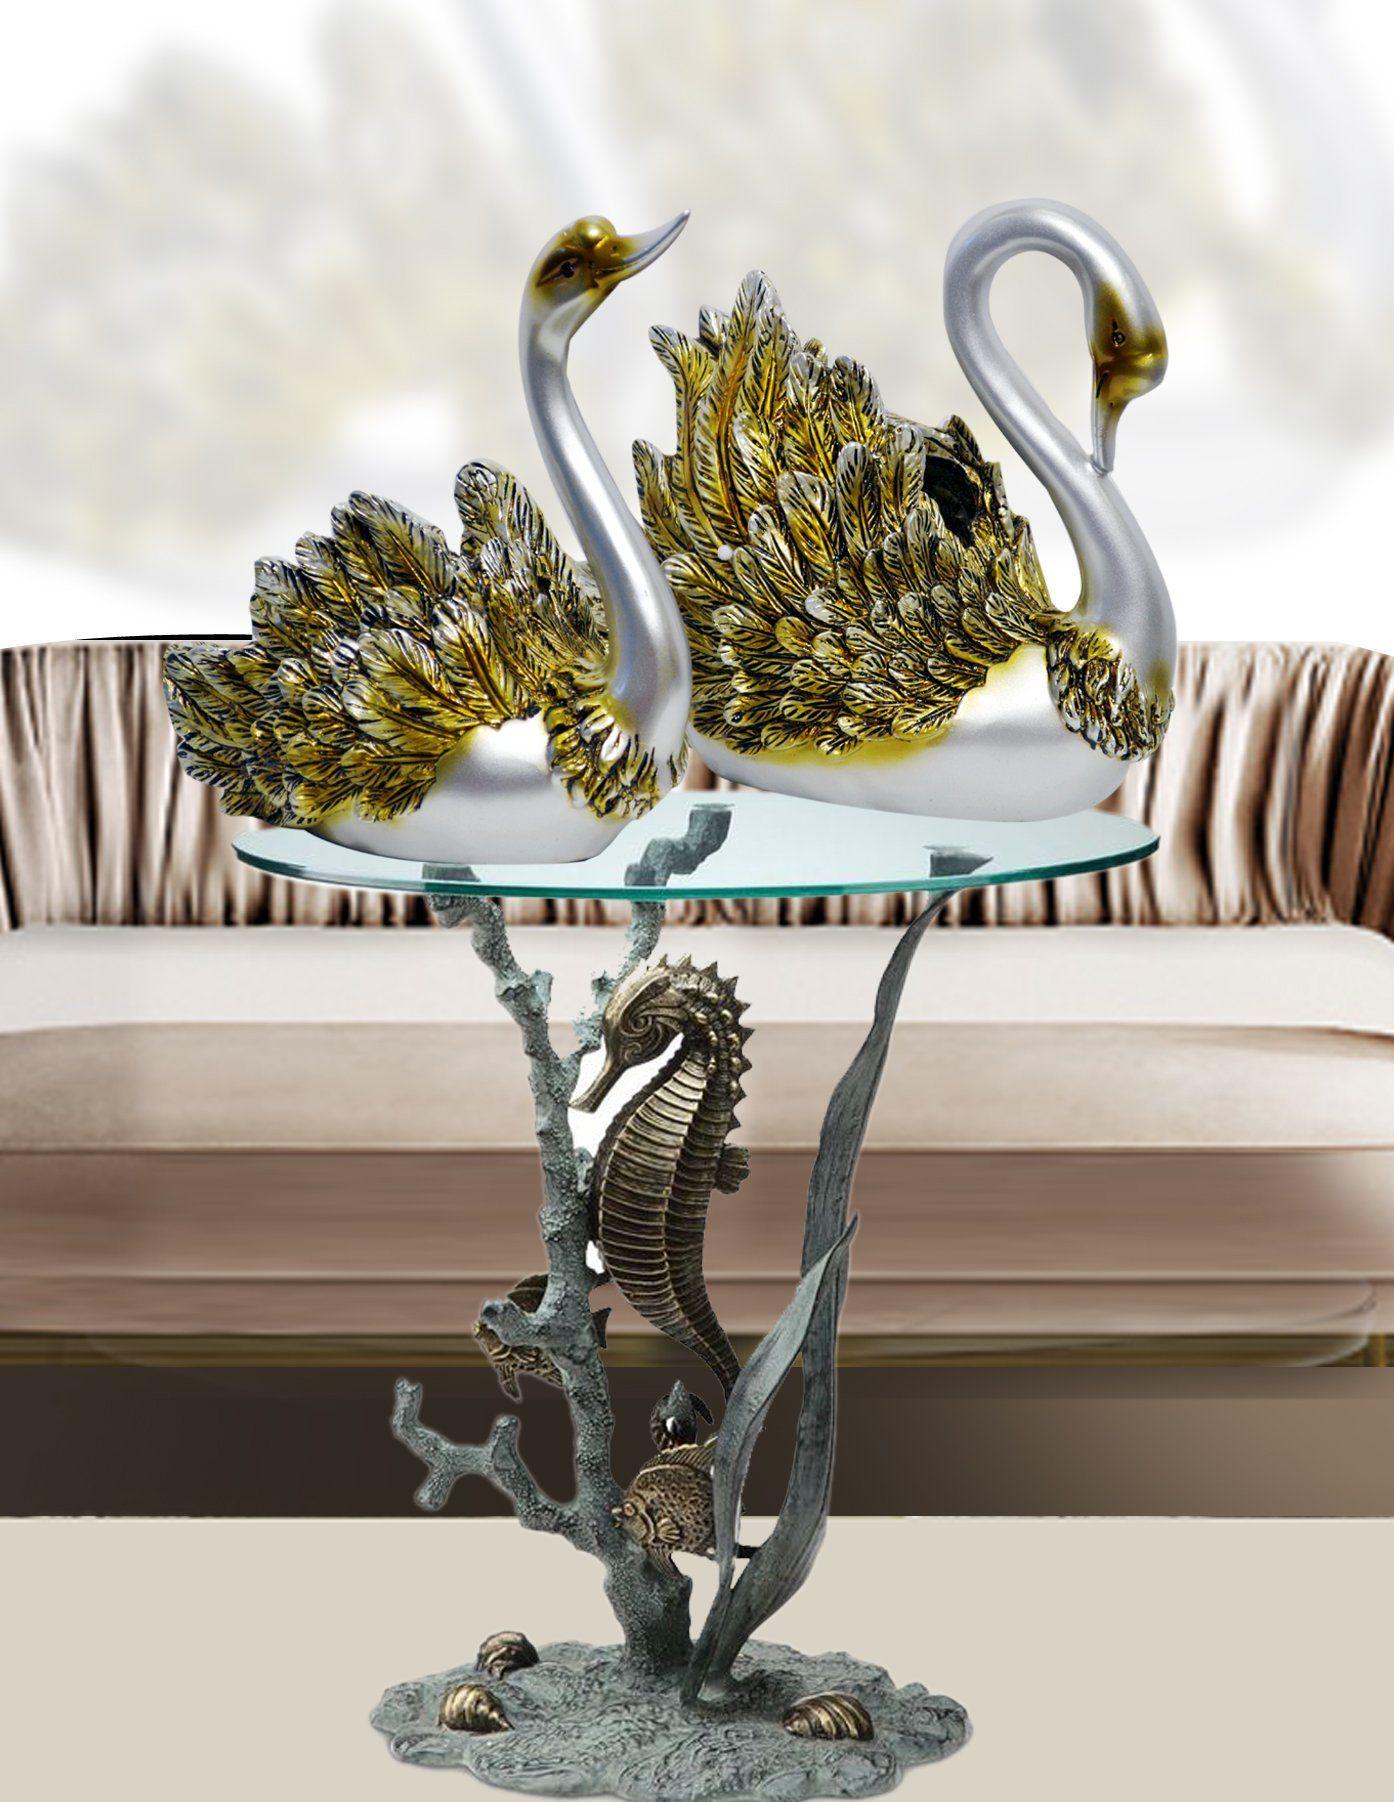 Resin Phoenix Figurine Pure Golden Bird Of Wonder Statue Animal Sculpture Decor